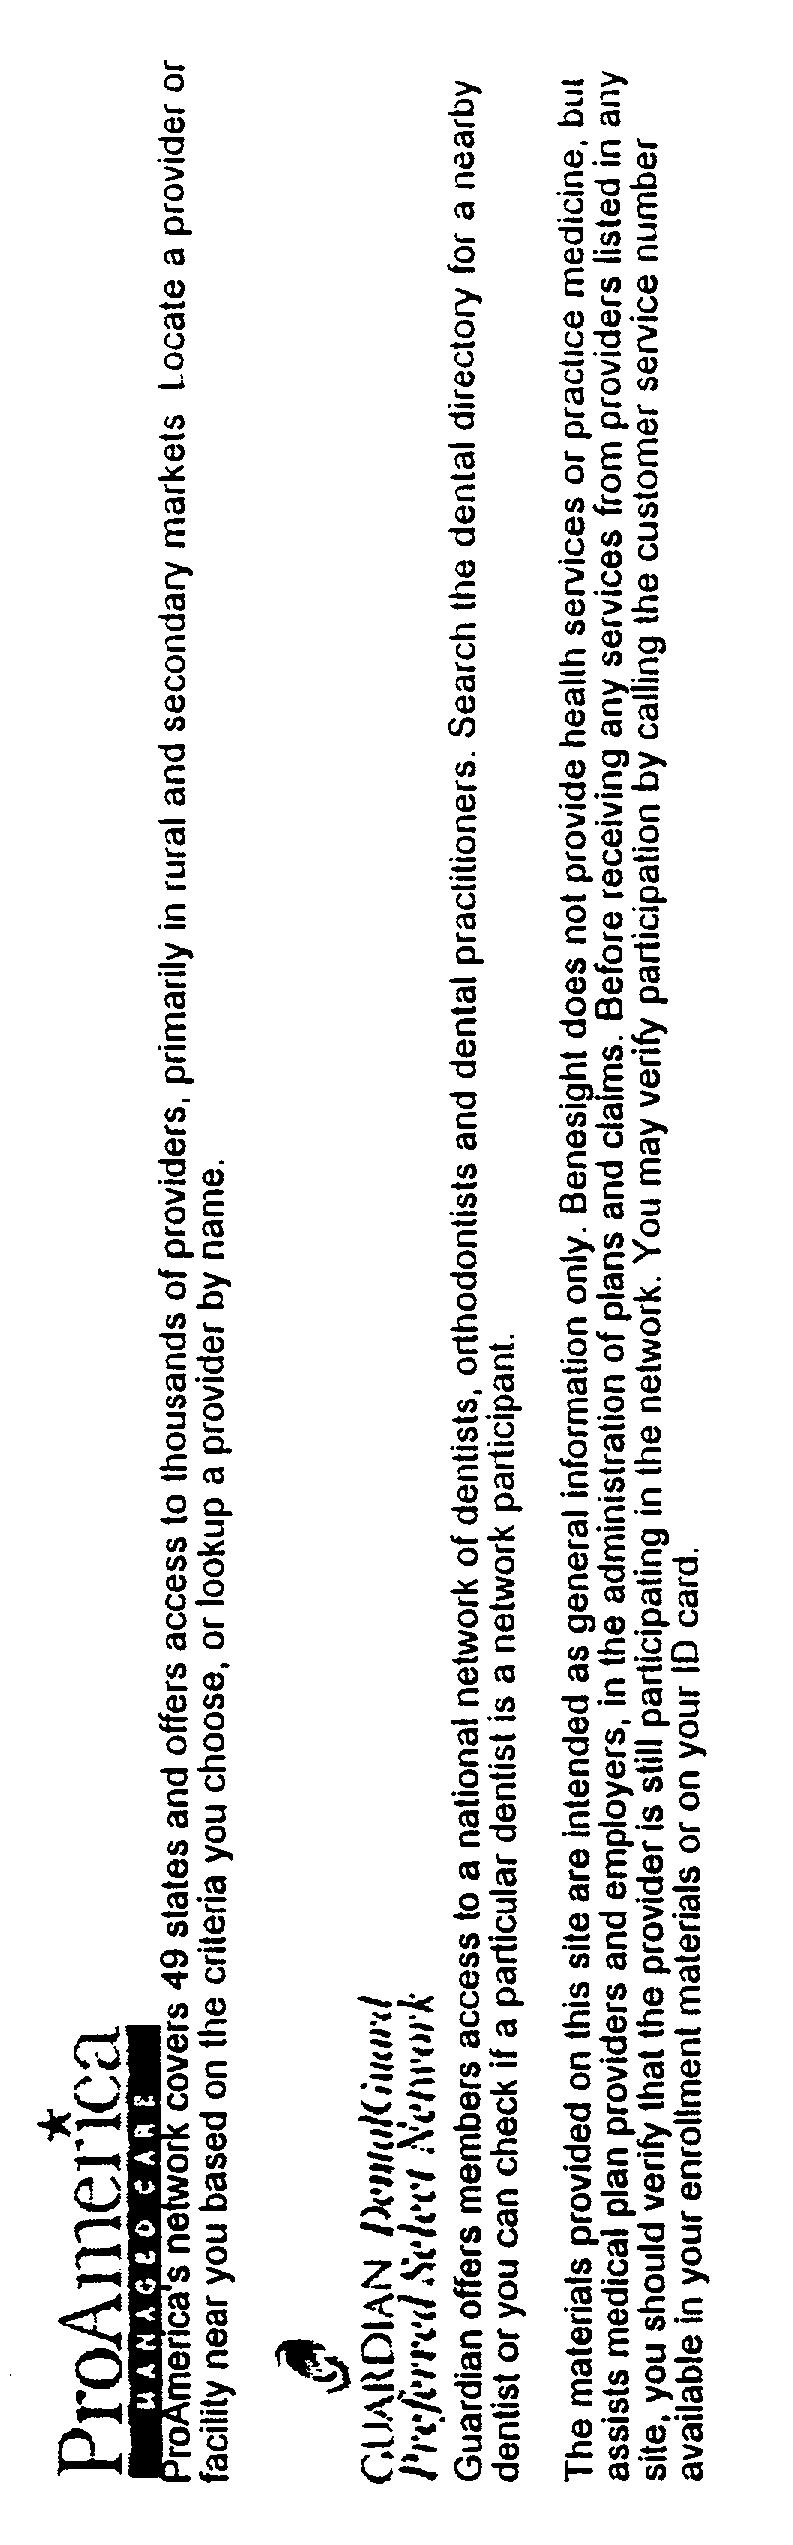 Figure US20020149616A1-20021017-P00137